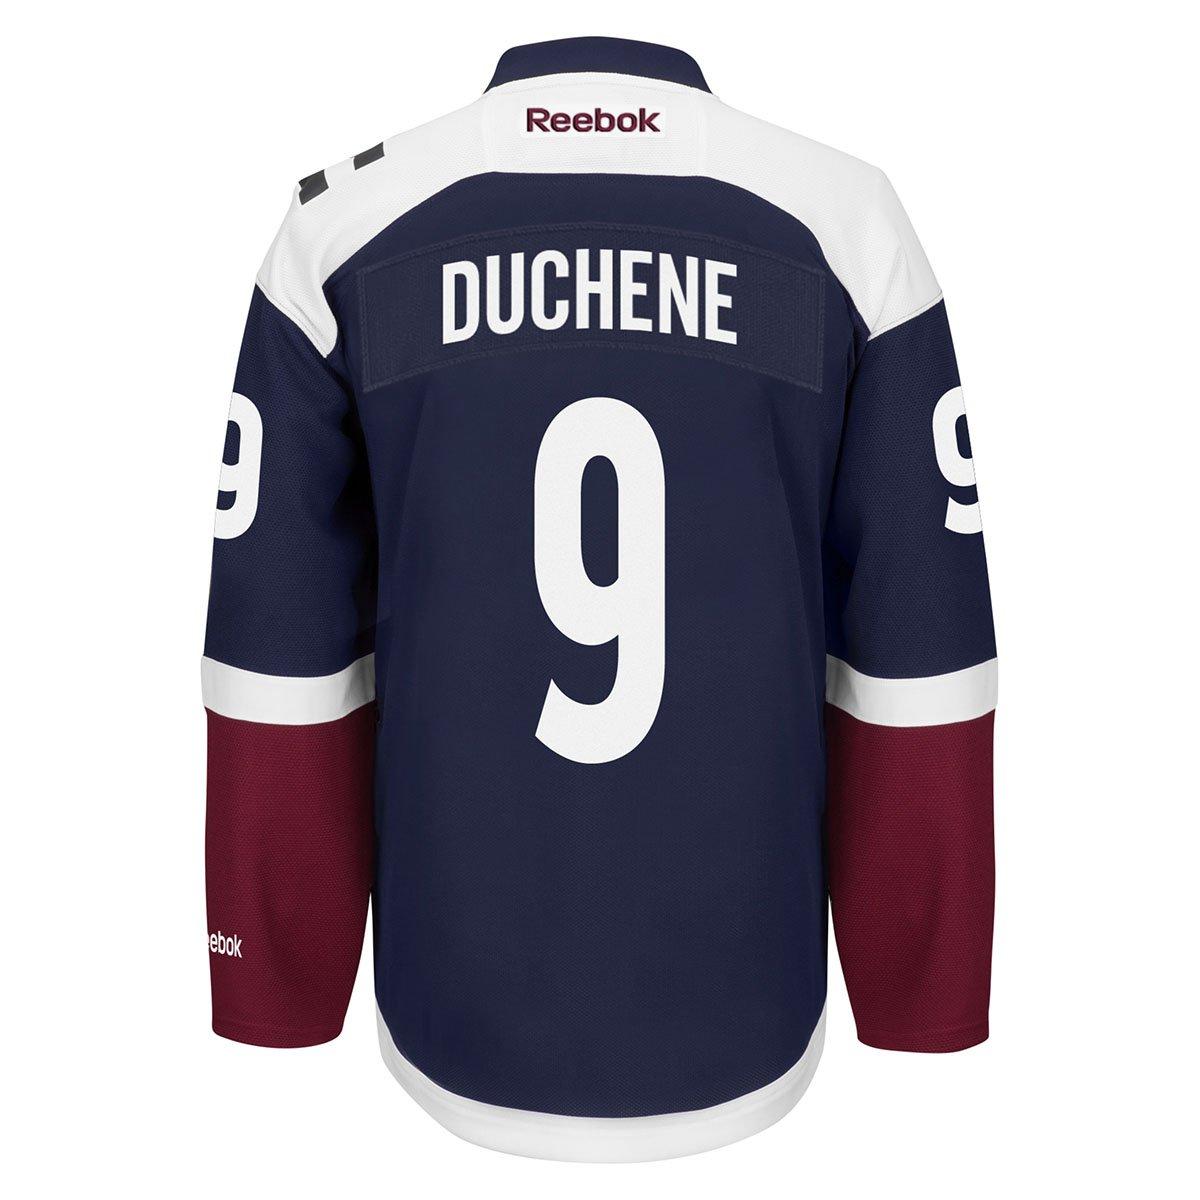 45e4caf20 Amazon.com   Matt Duchene Colorado Avalanche NHL Reebok Navy Blue Official  Premier 3rd Alternate Jersey For Men (4XL)   Sports   Outdoors